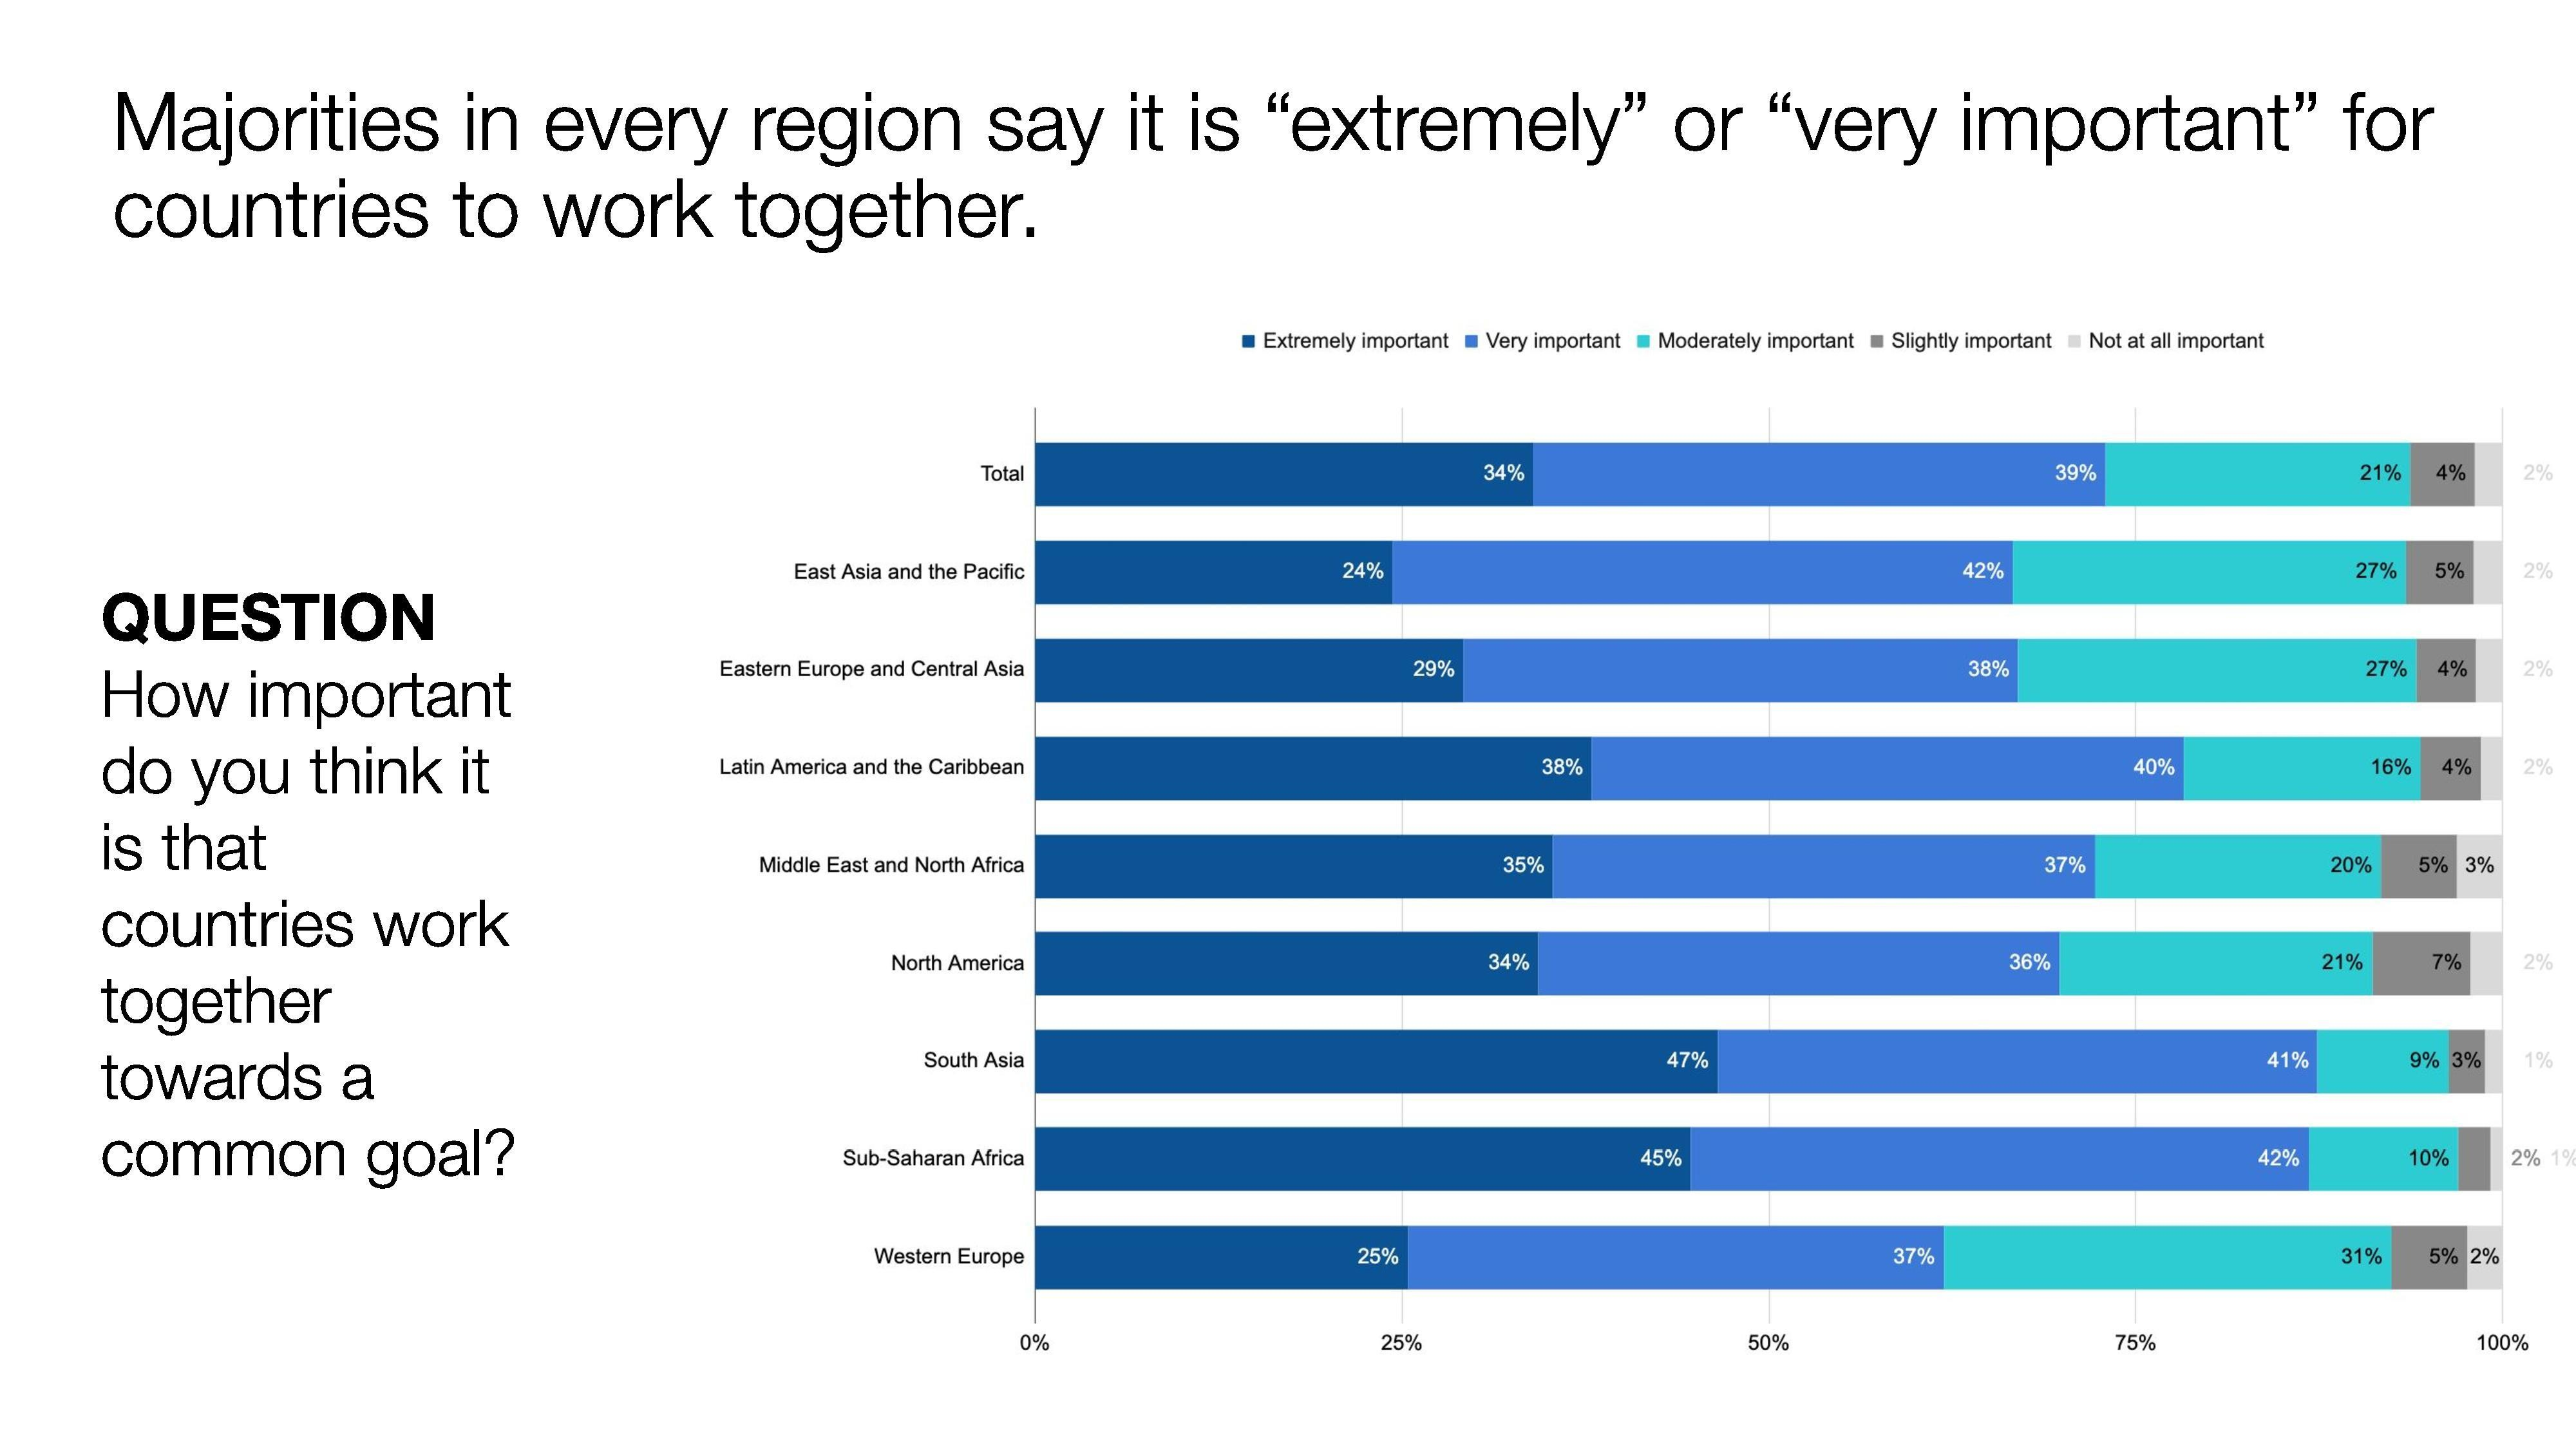 global goals cooperation